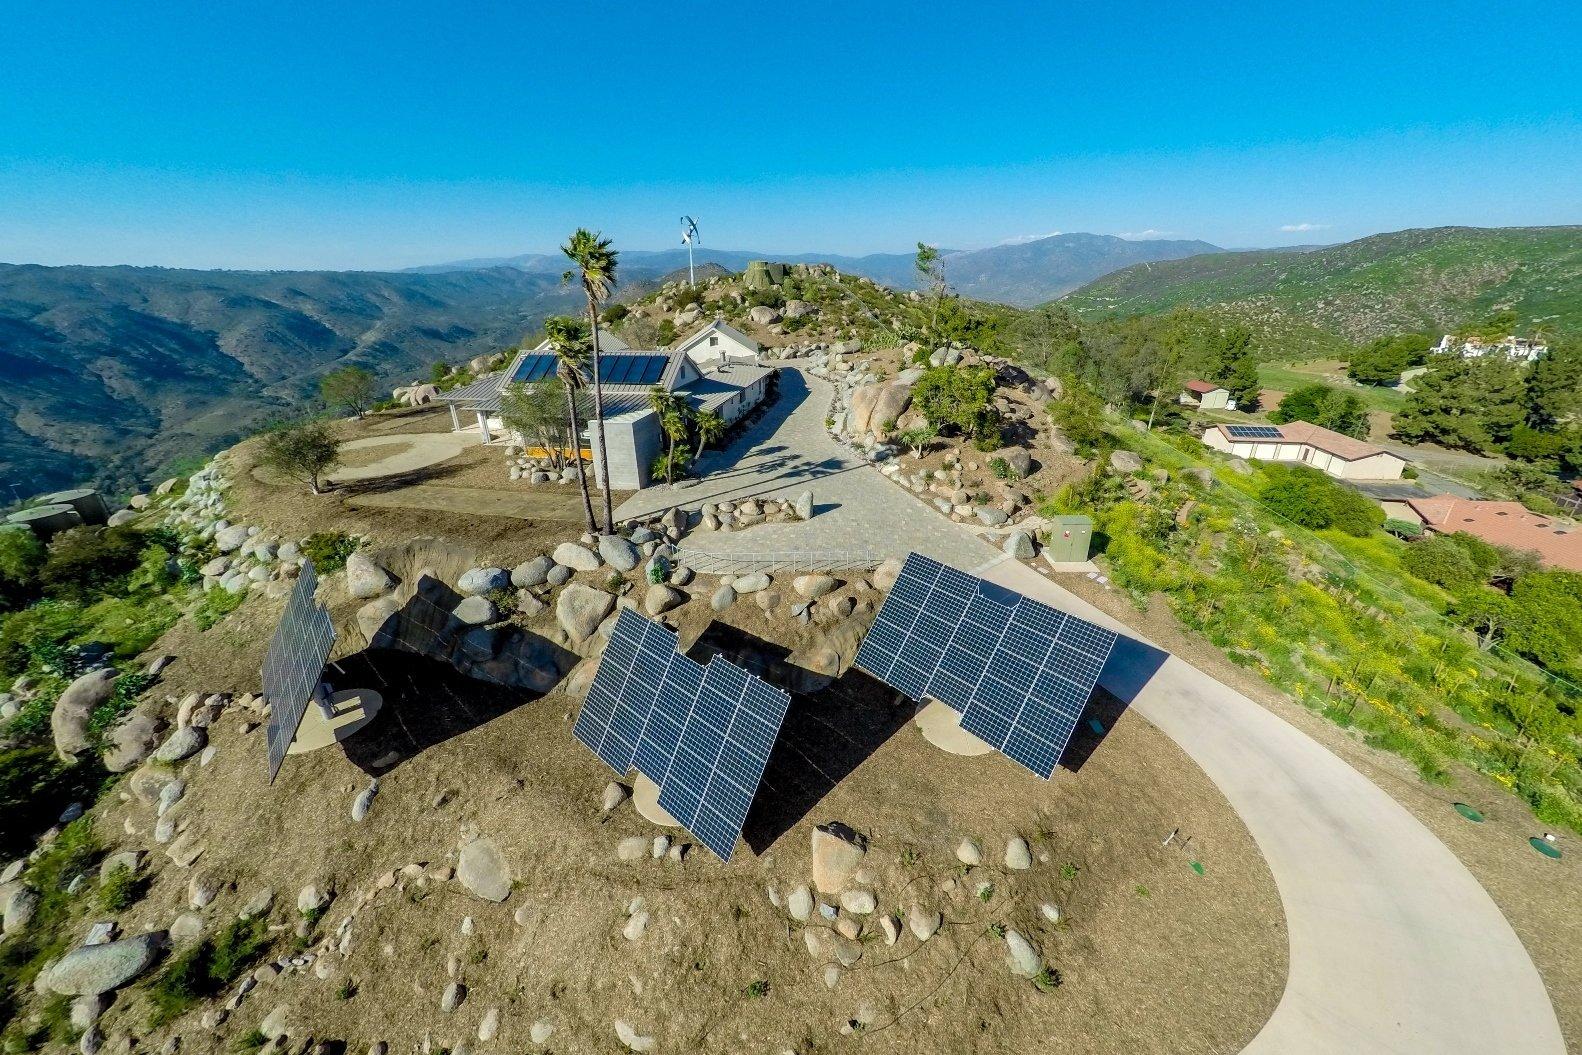 Casa Aguila Drone Photo of Home and Solar Panels  Casa Aguila by Maureen Brennan